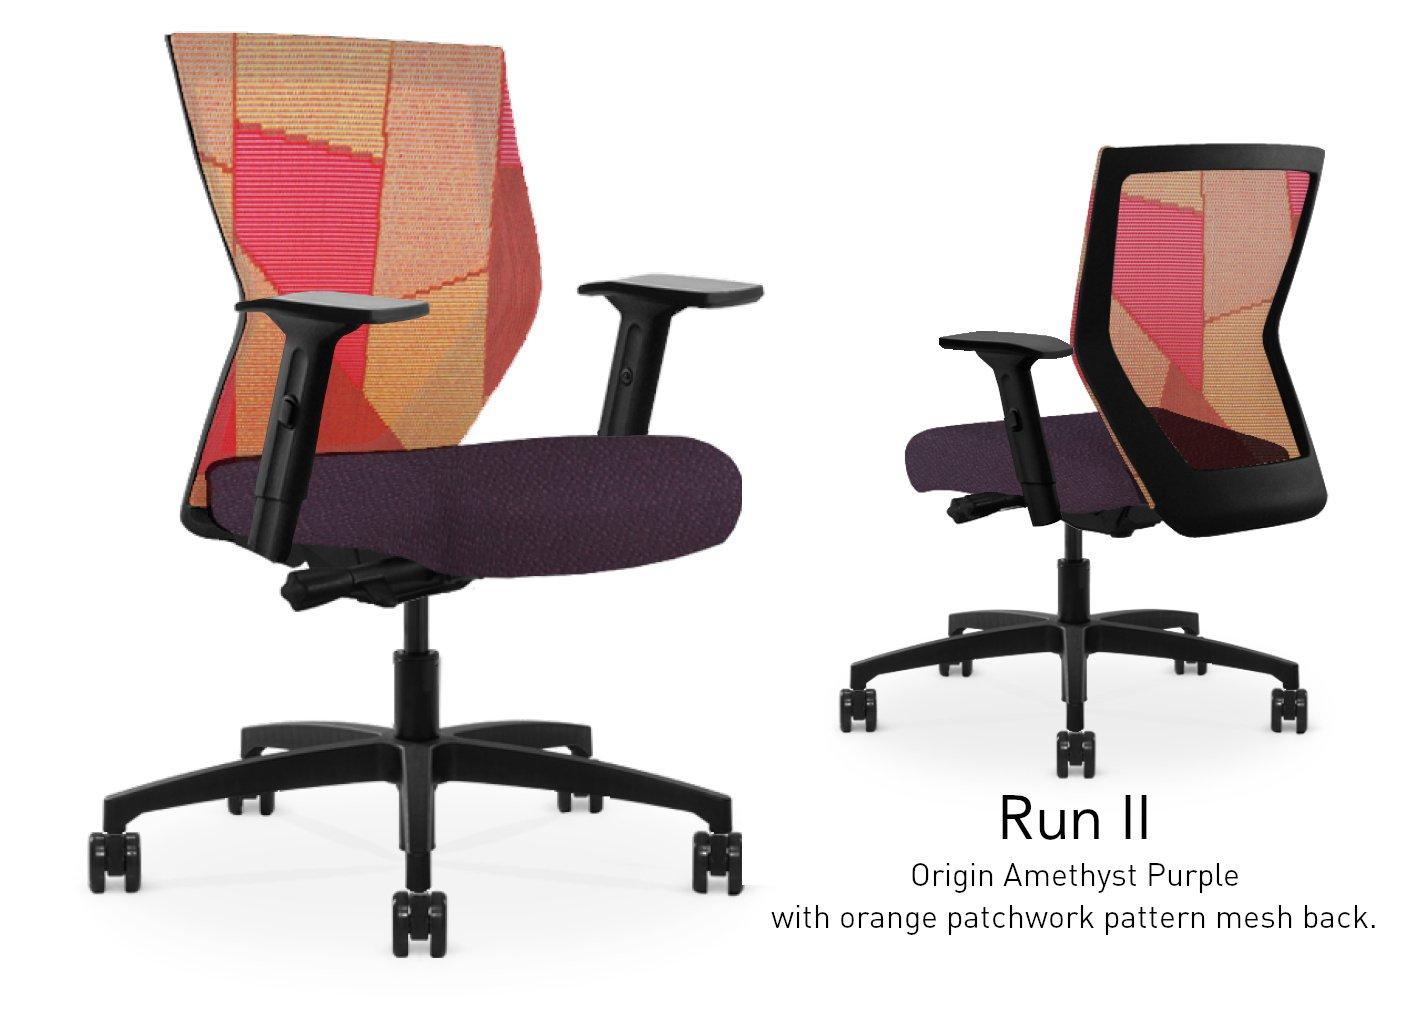 Run II High Back Black Frame Office Chair with Orange Patchwork Mesh Back